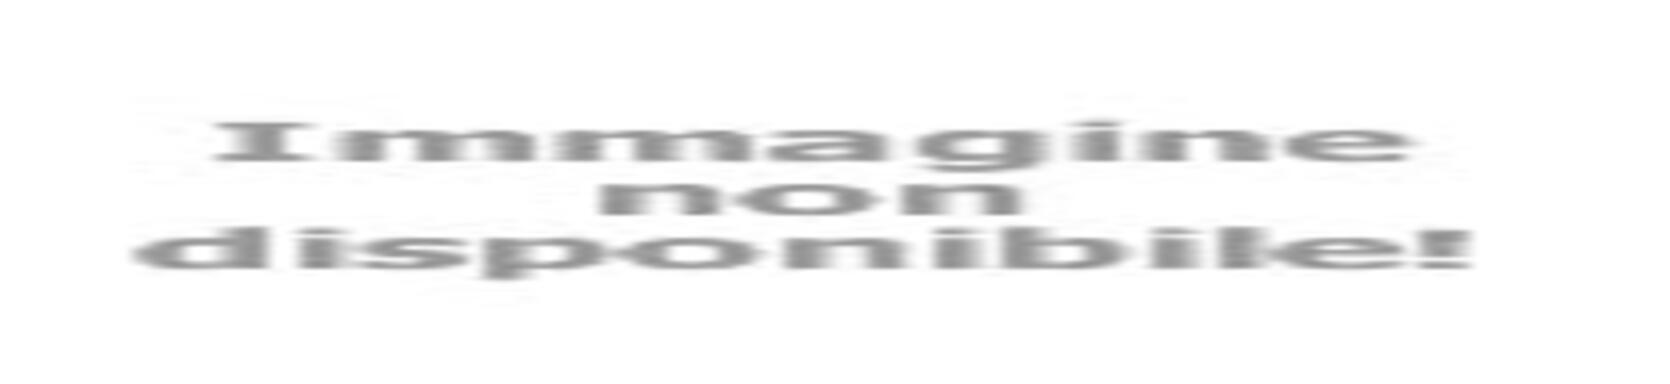 basketriminicrabs it 2-2651-settore-giovanile-u15-ecc-a-il-derby-va-a-santarcangelo 003